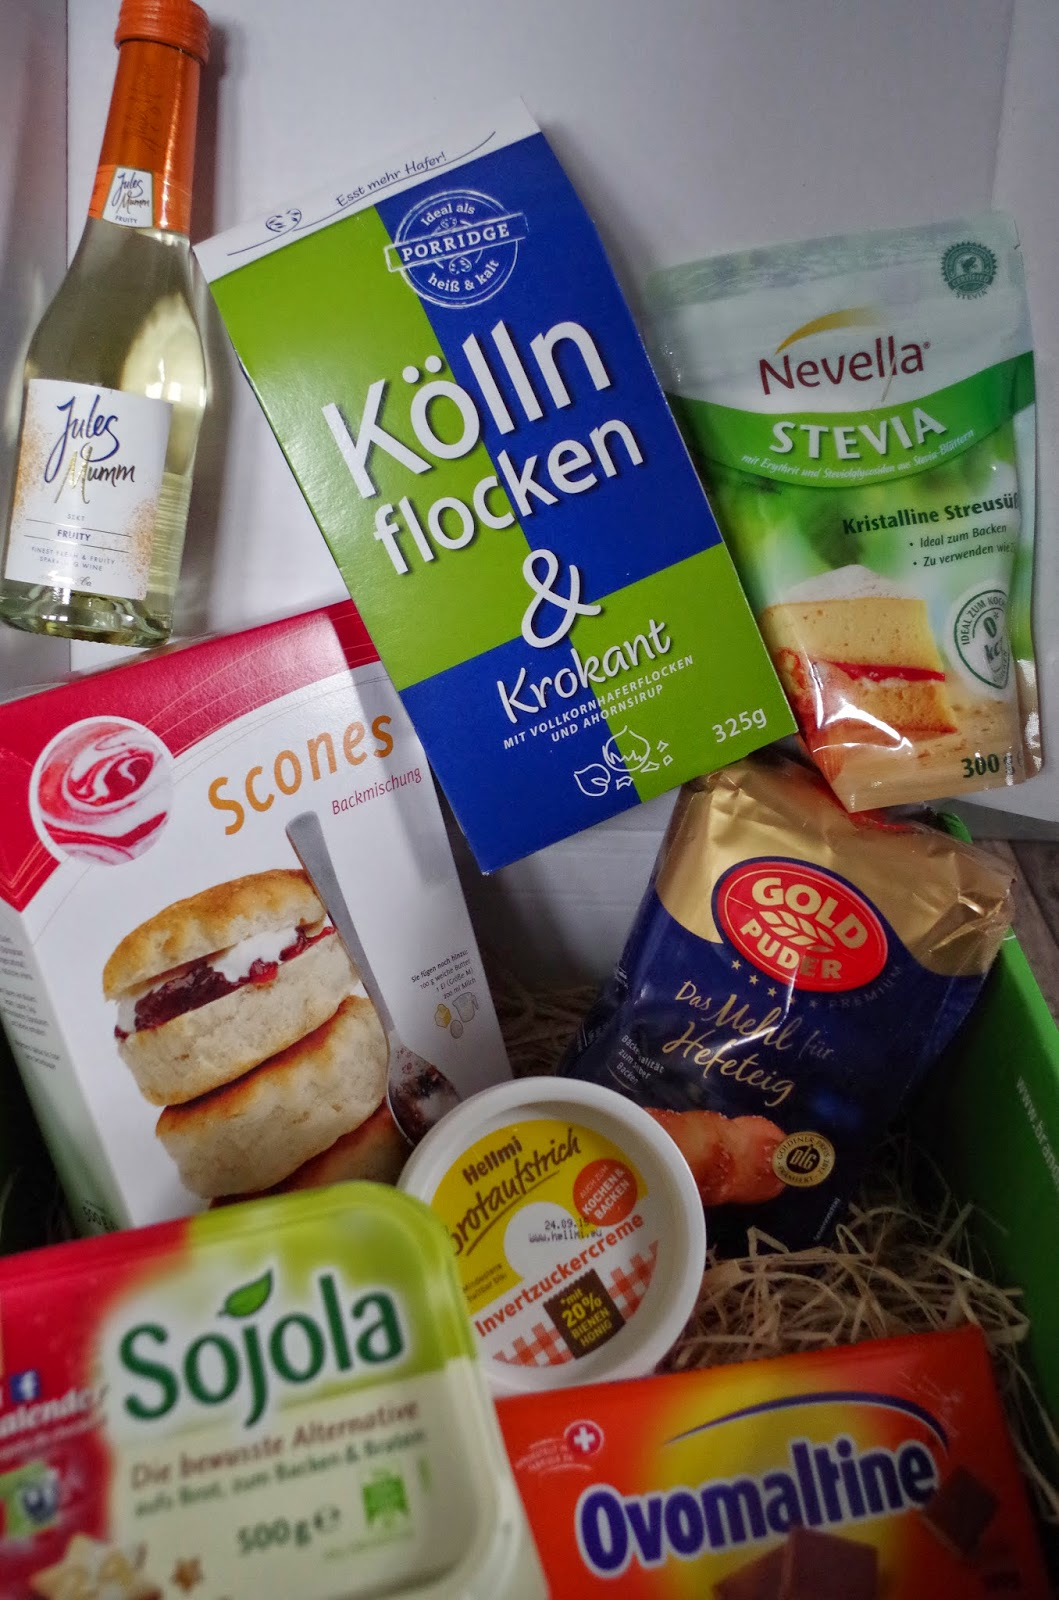 Weihnachtsbäckerei; Überraschung; Lebensmittel; Box